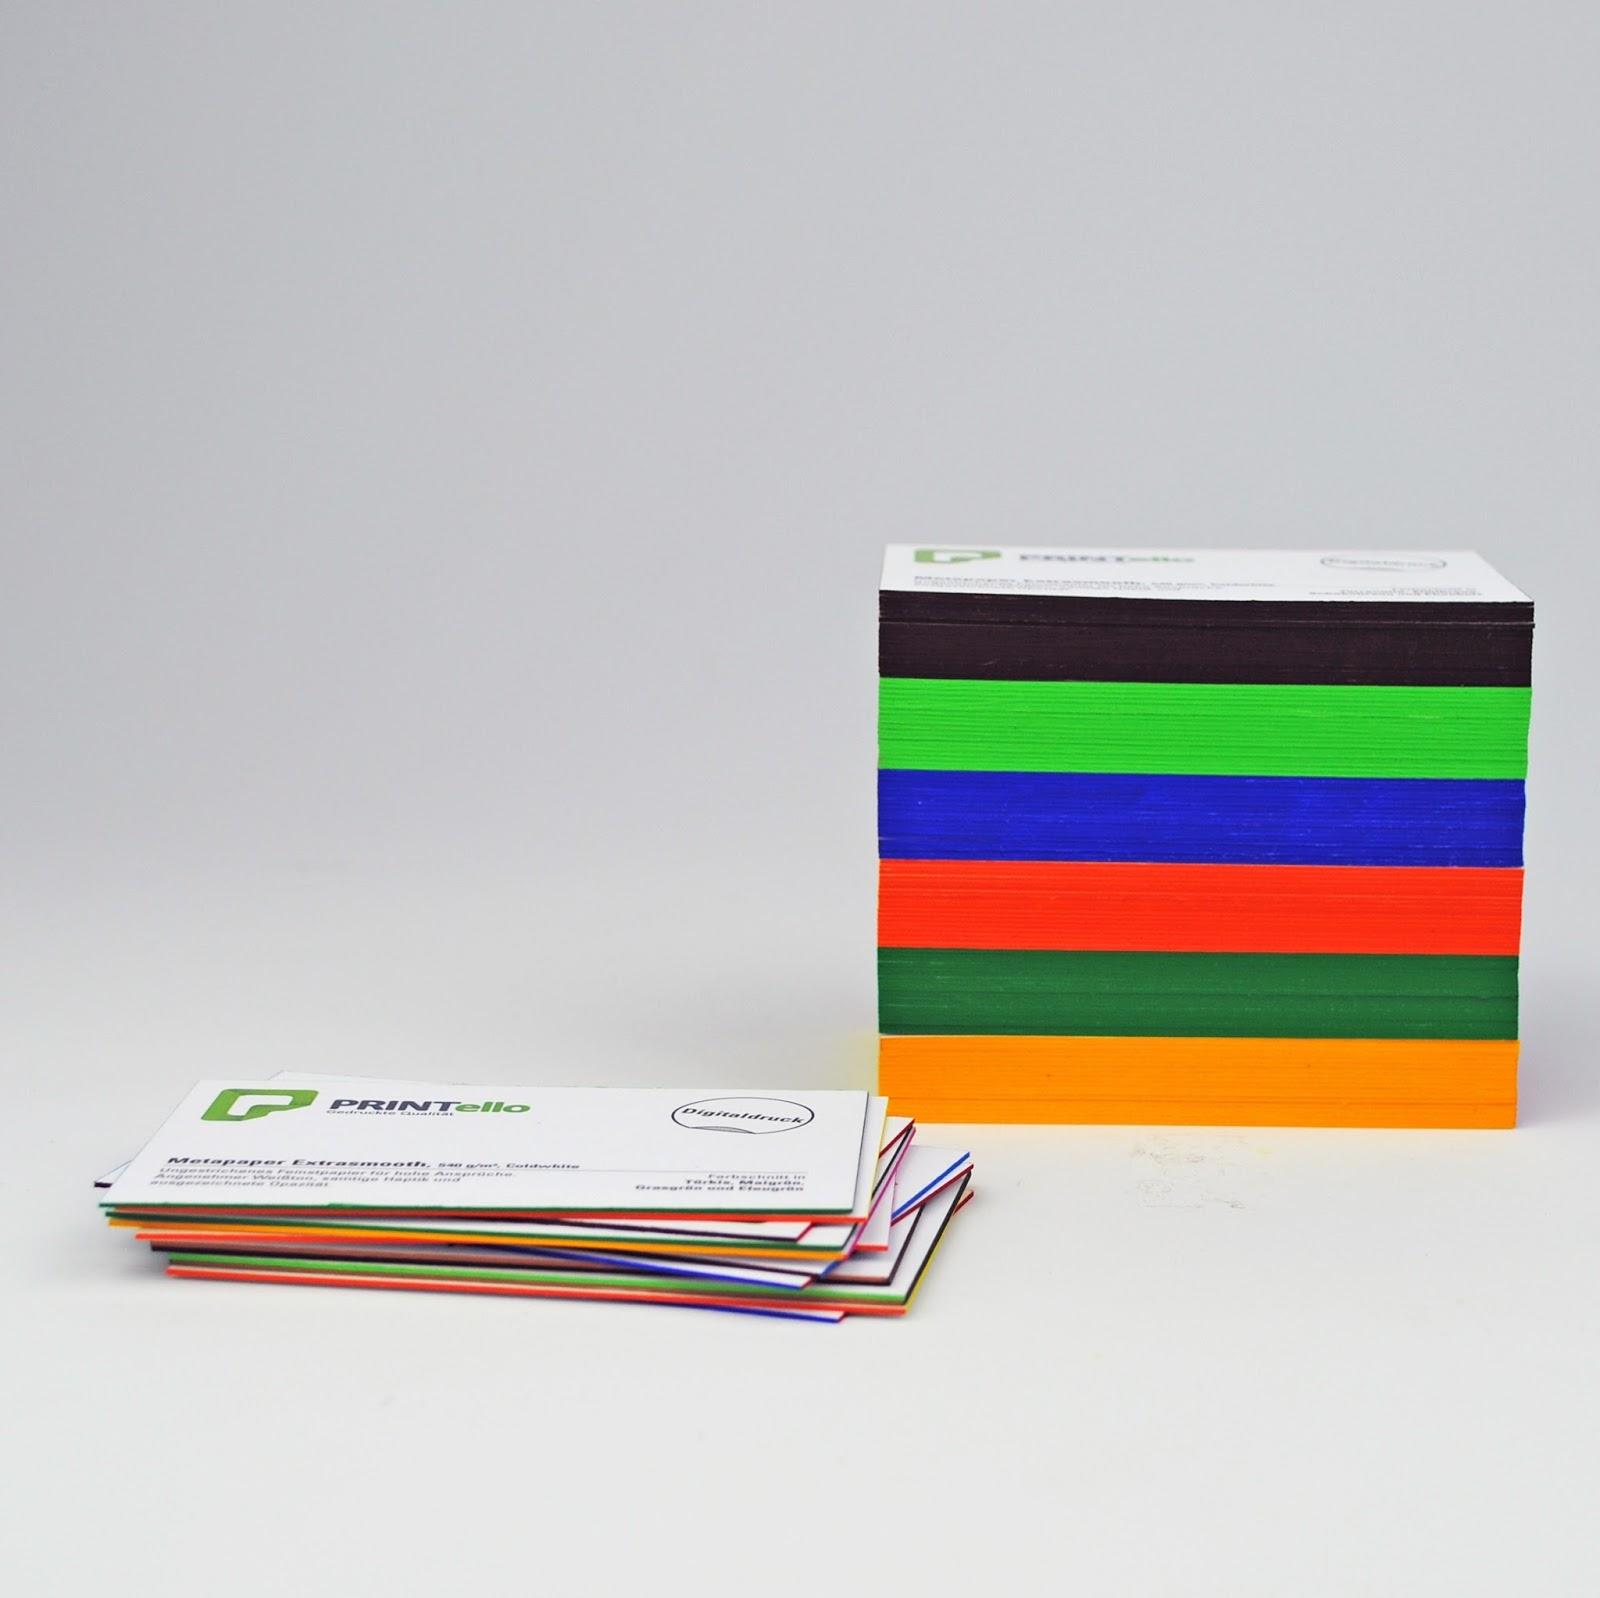 Printello Blog Visitenkarten Mit Farbschnitt Drucken Lassen